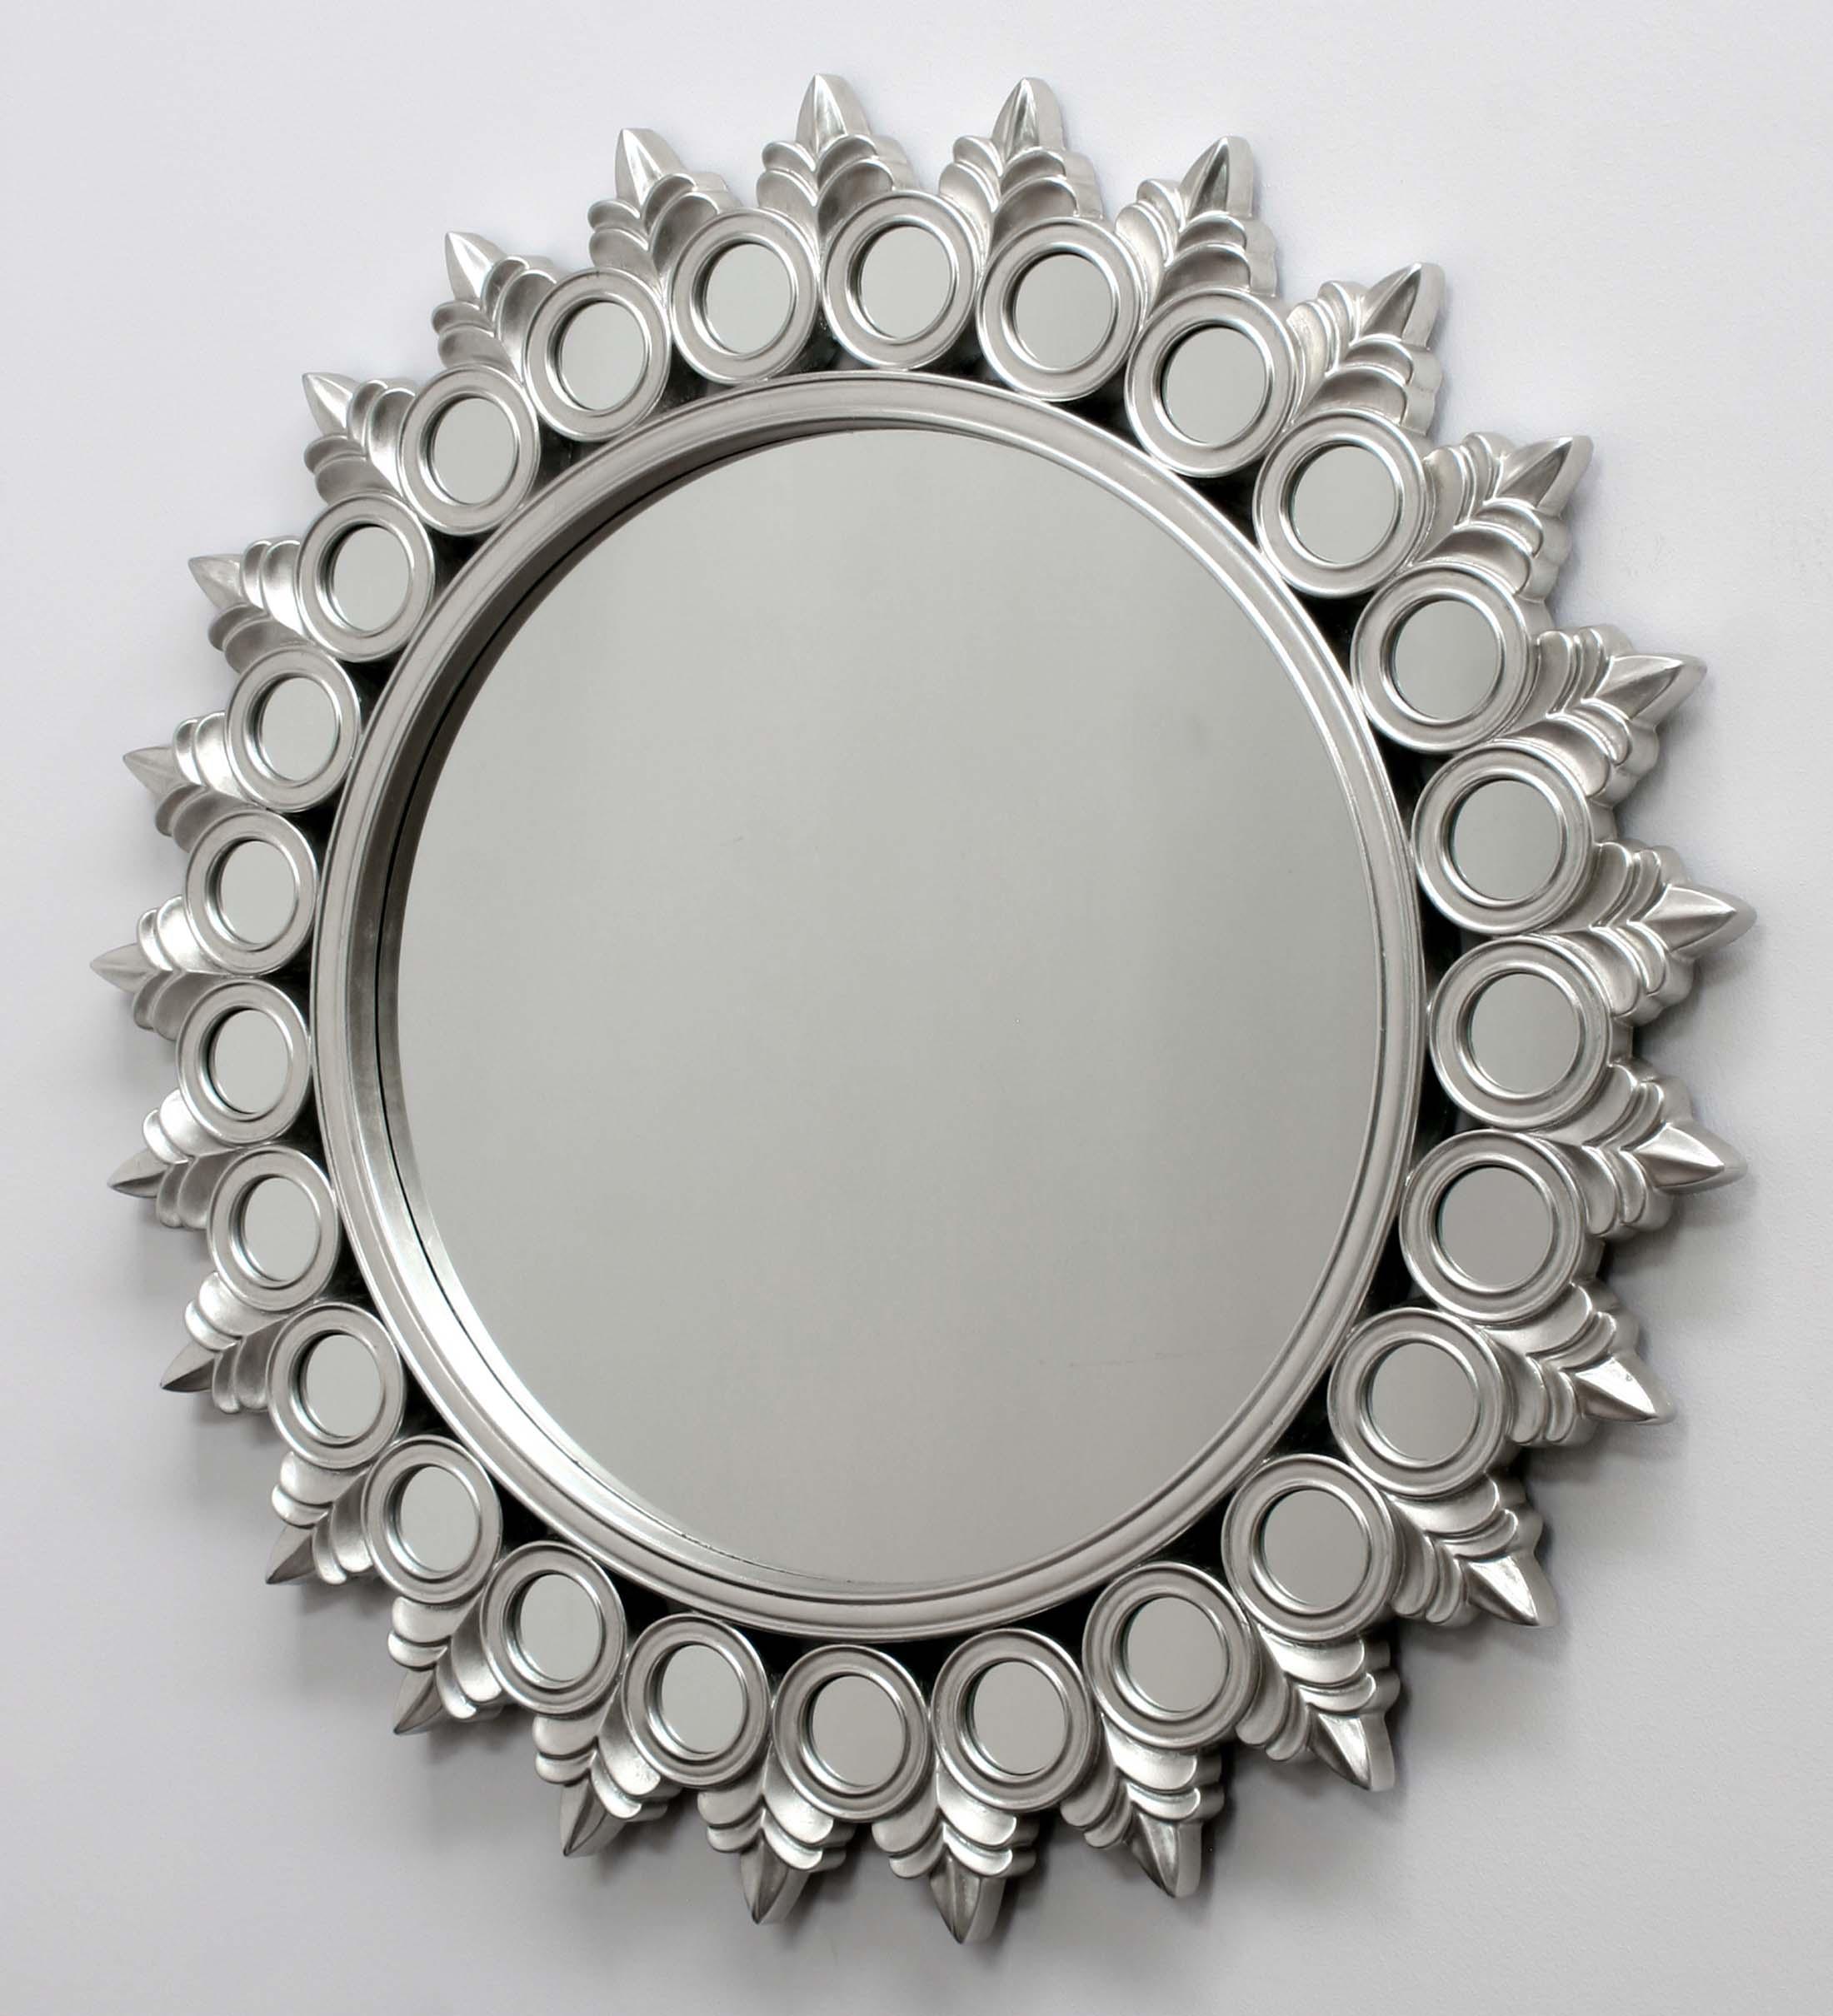 Espejo plateado de dise o moderno hecho en resina for Espejo de pie plateado